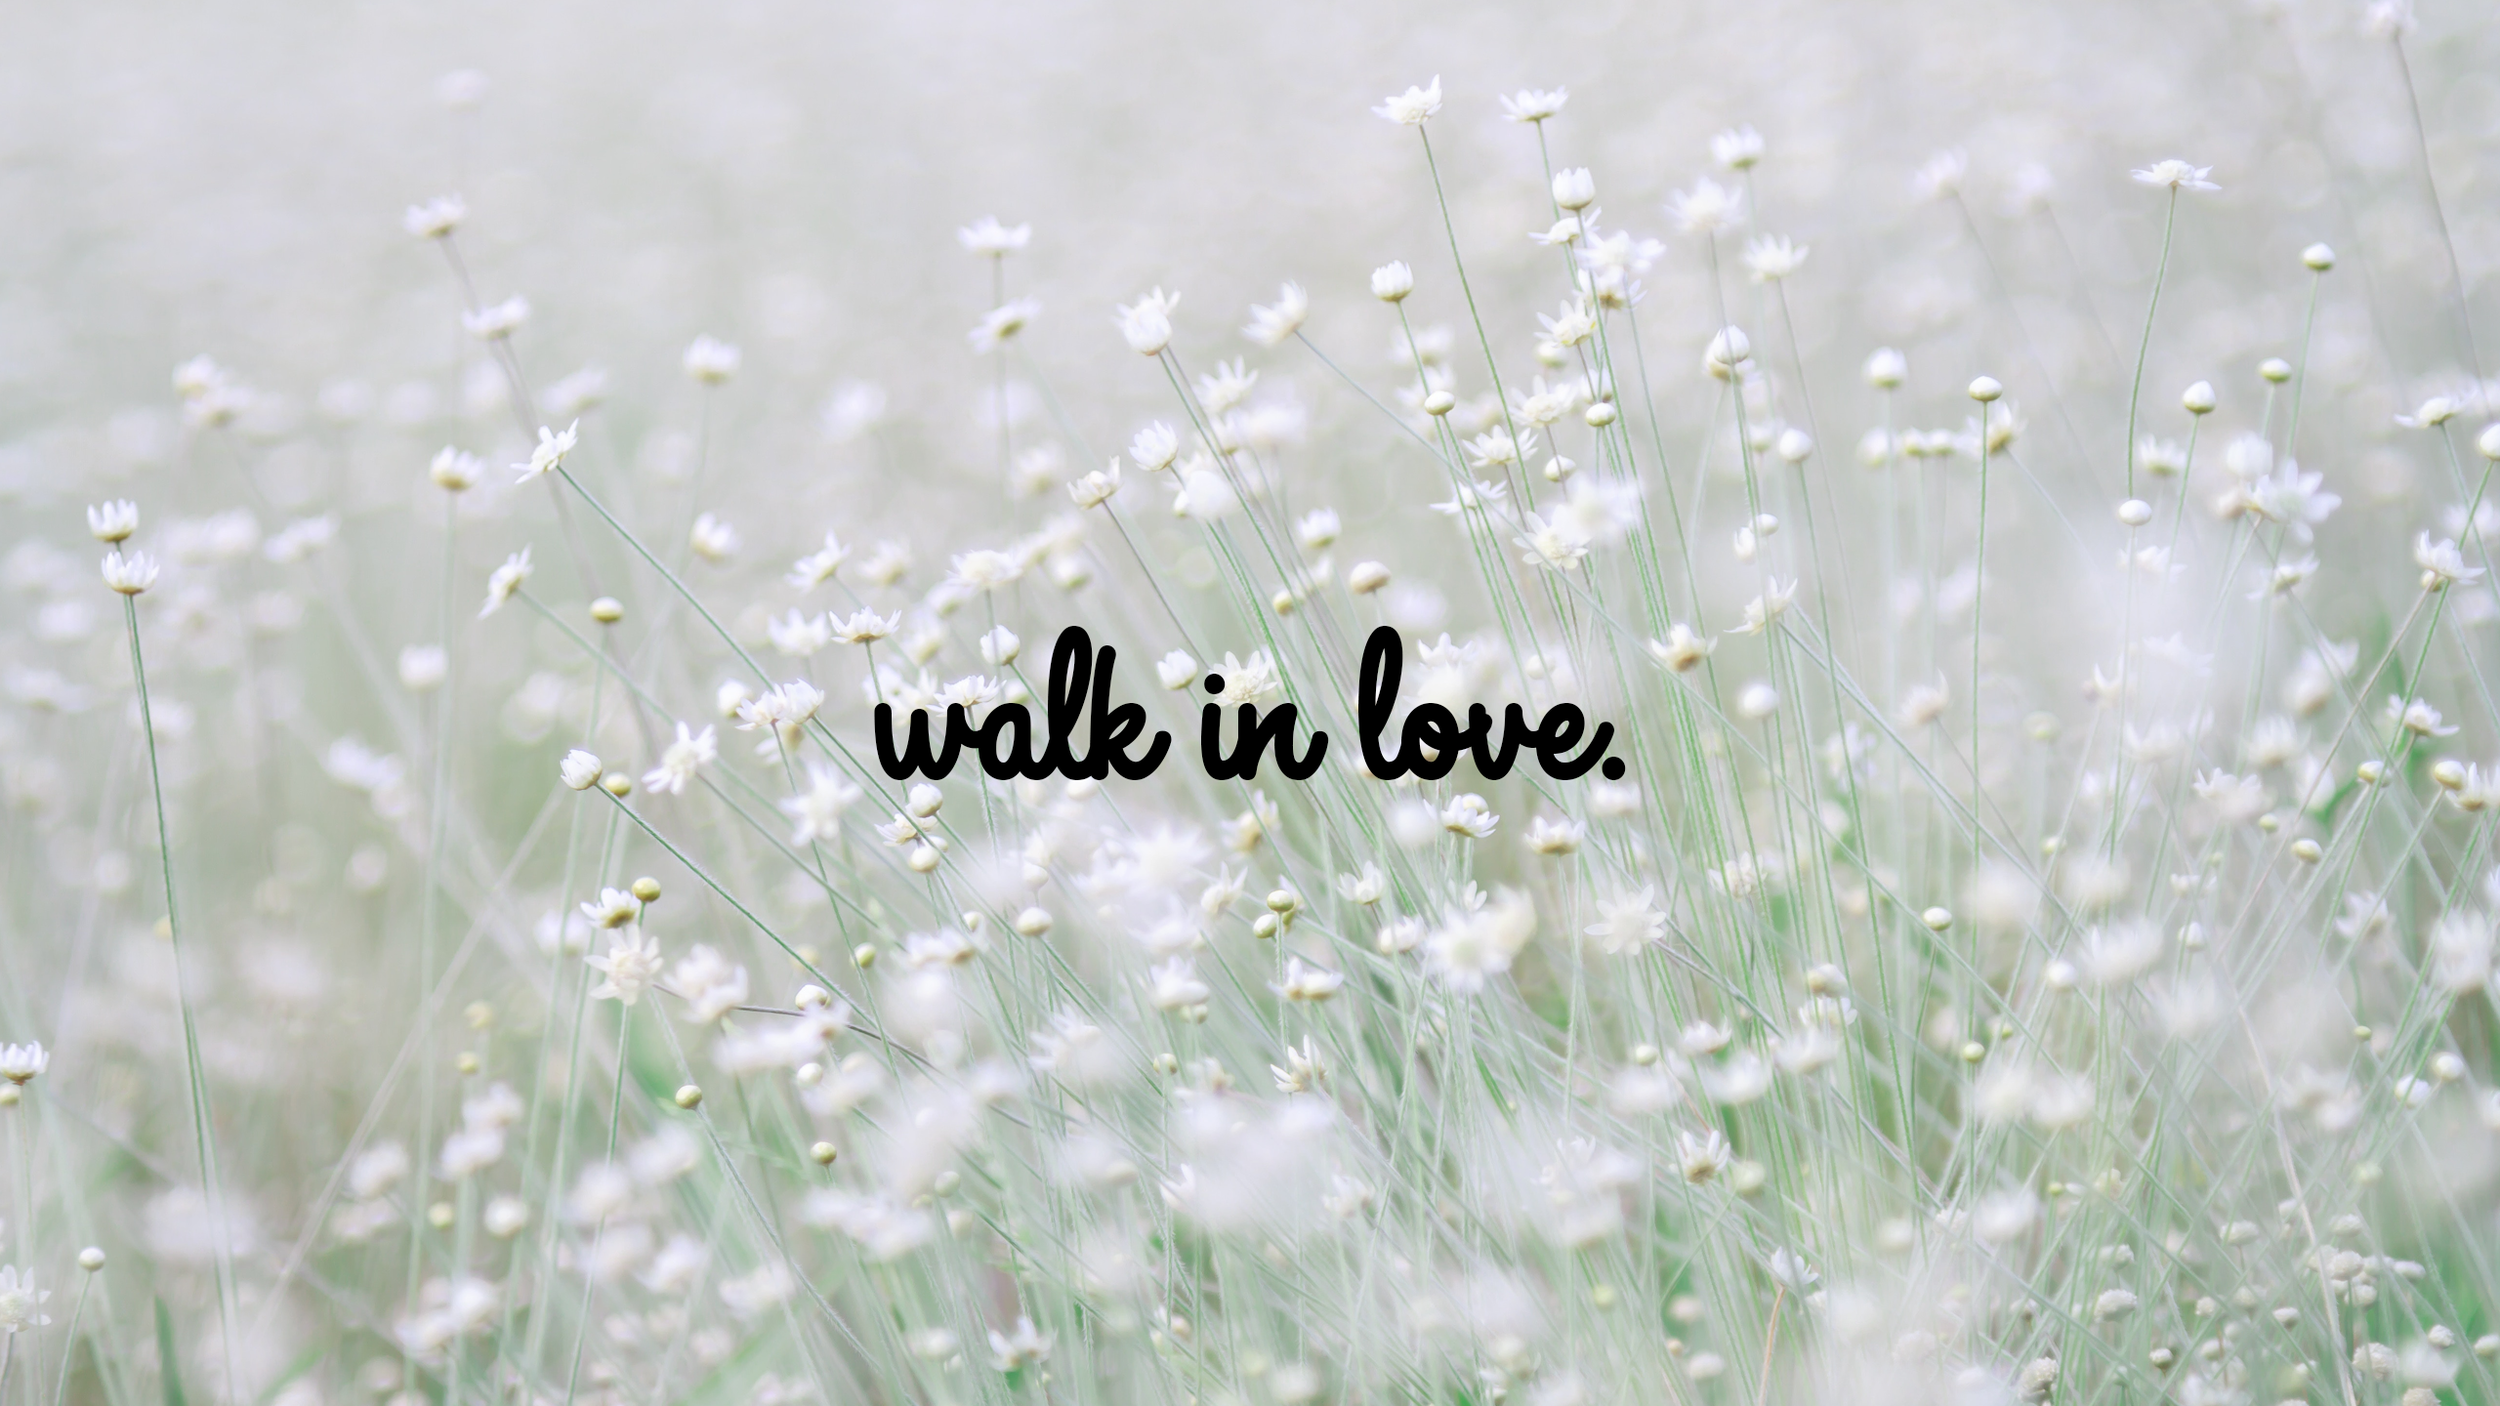 walkinlove-imac.png